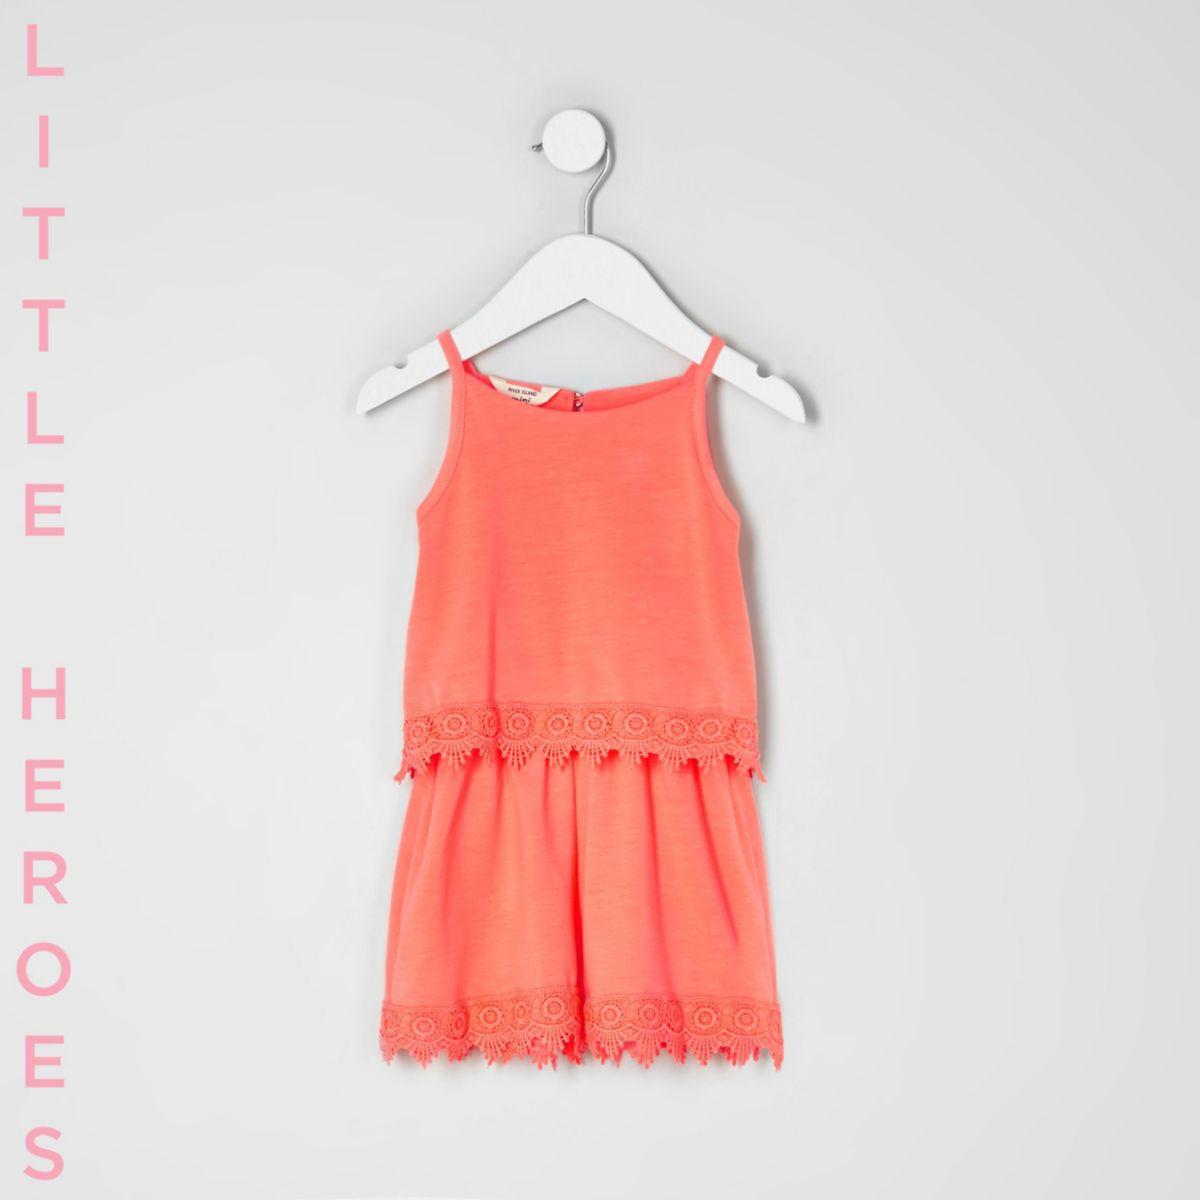 Combi-short corail orange au crochet mini fille